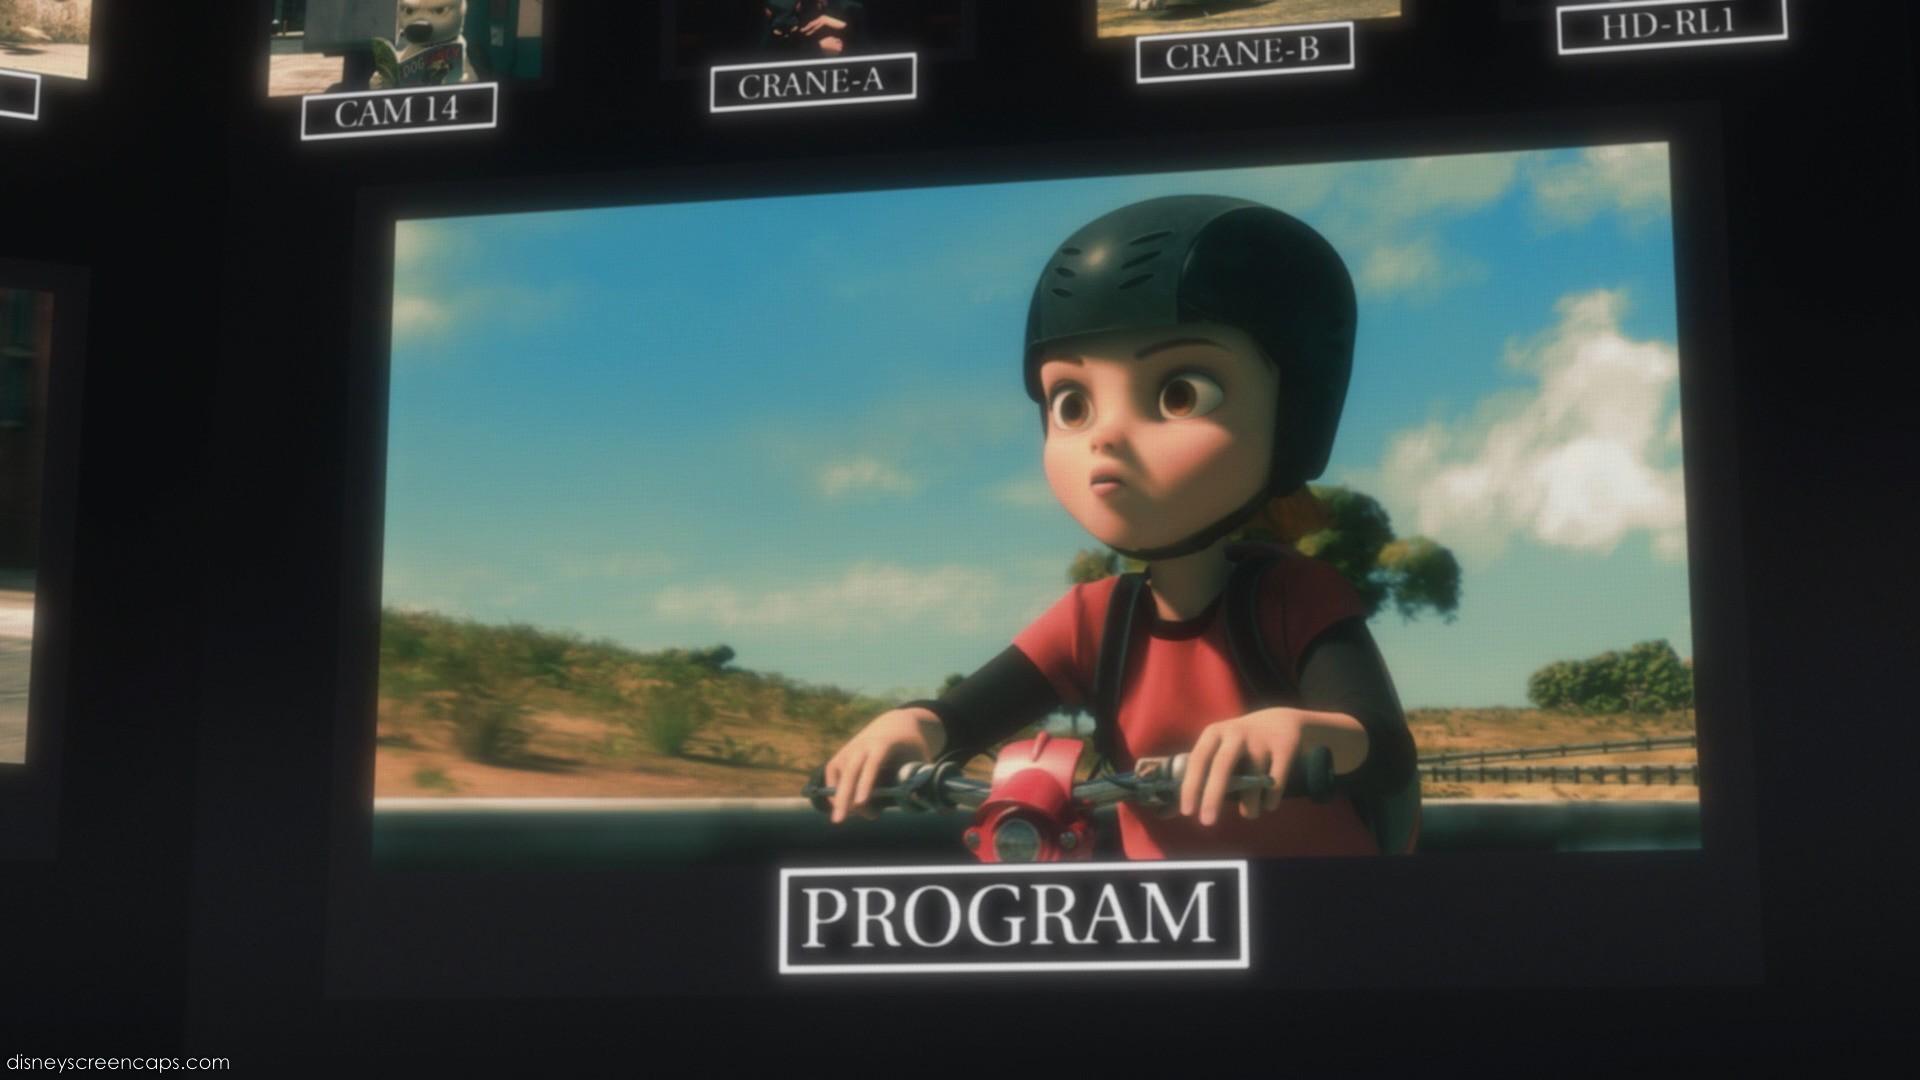 meet the robinsons full movie bahasa indonesia language